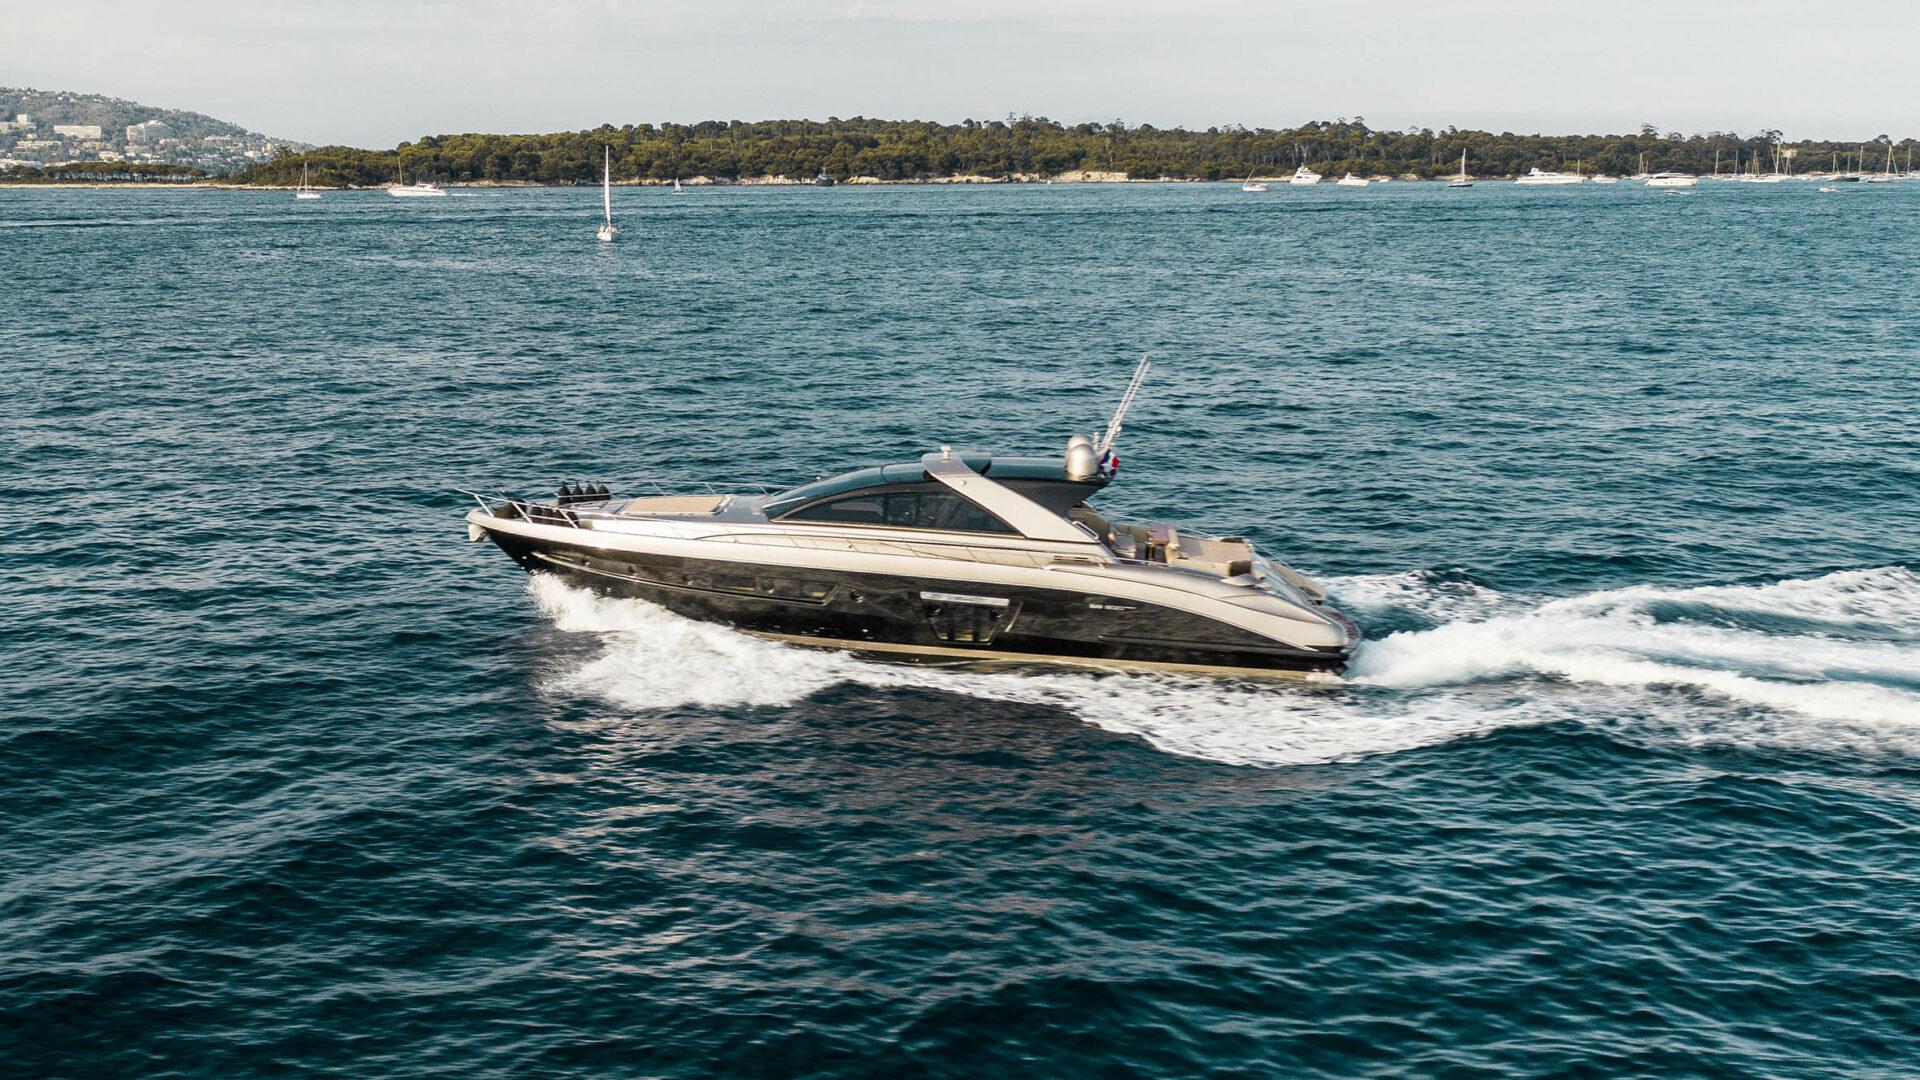 https://lengersyachts.de/wp-content/uploads//2018/09/Riva-Ego-Super-20-exterior-Lengers-Yachts-4-1920x1080.jpg